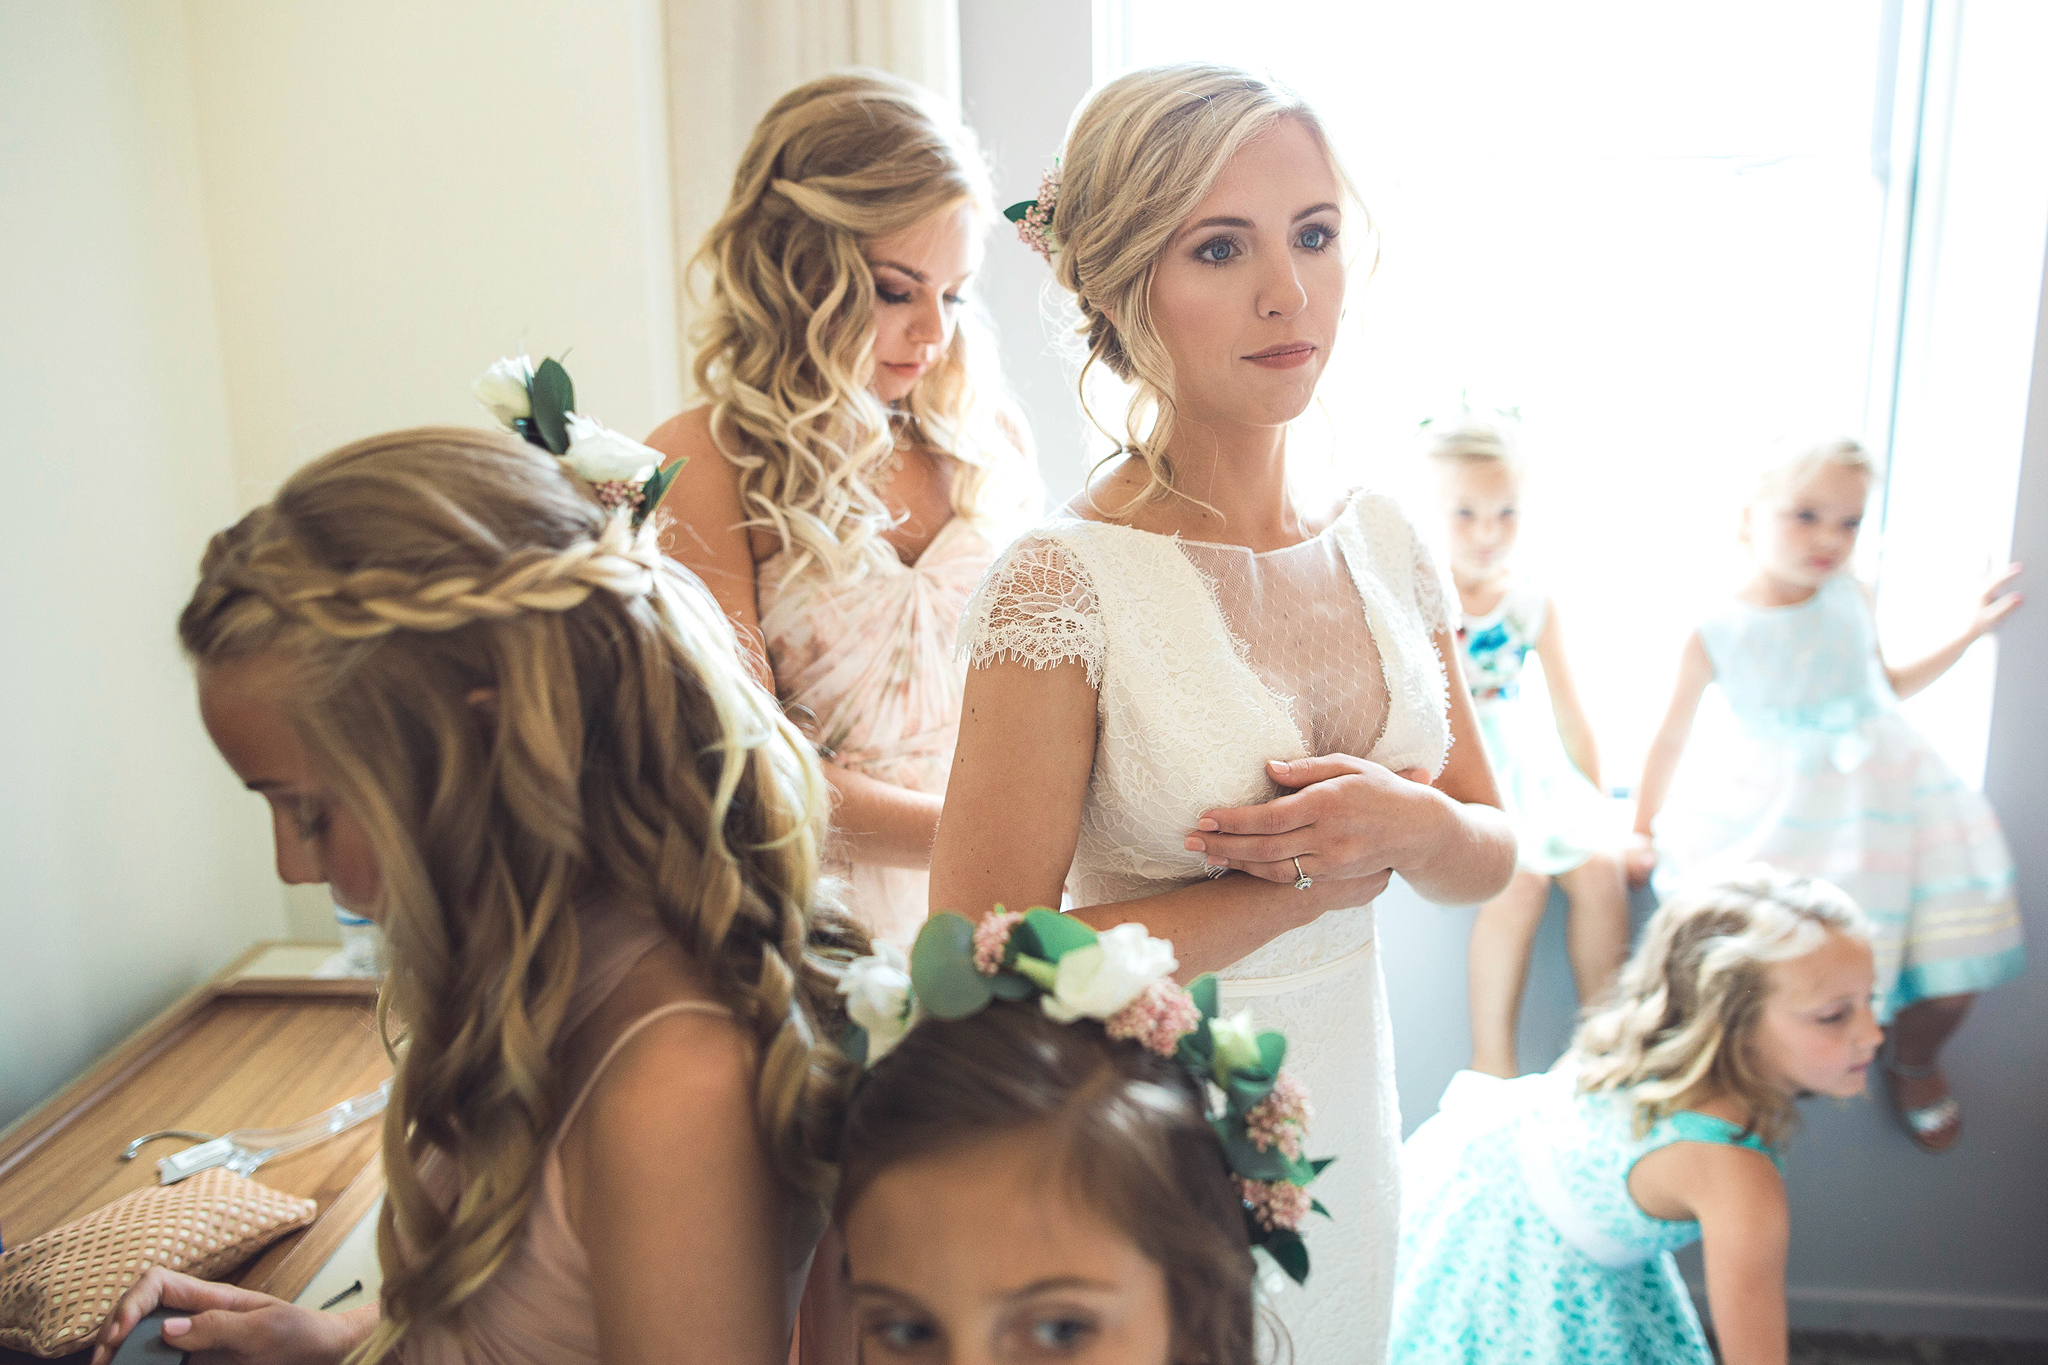 Cincinnati-Dayton-OH-Traveling-Wedding-Photographer-Rhinegeist-Brewery-Ault-Park-21C-51.jpg